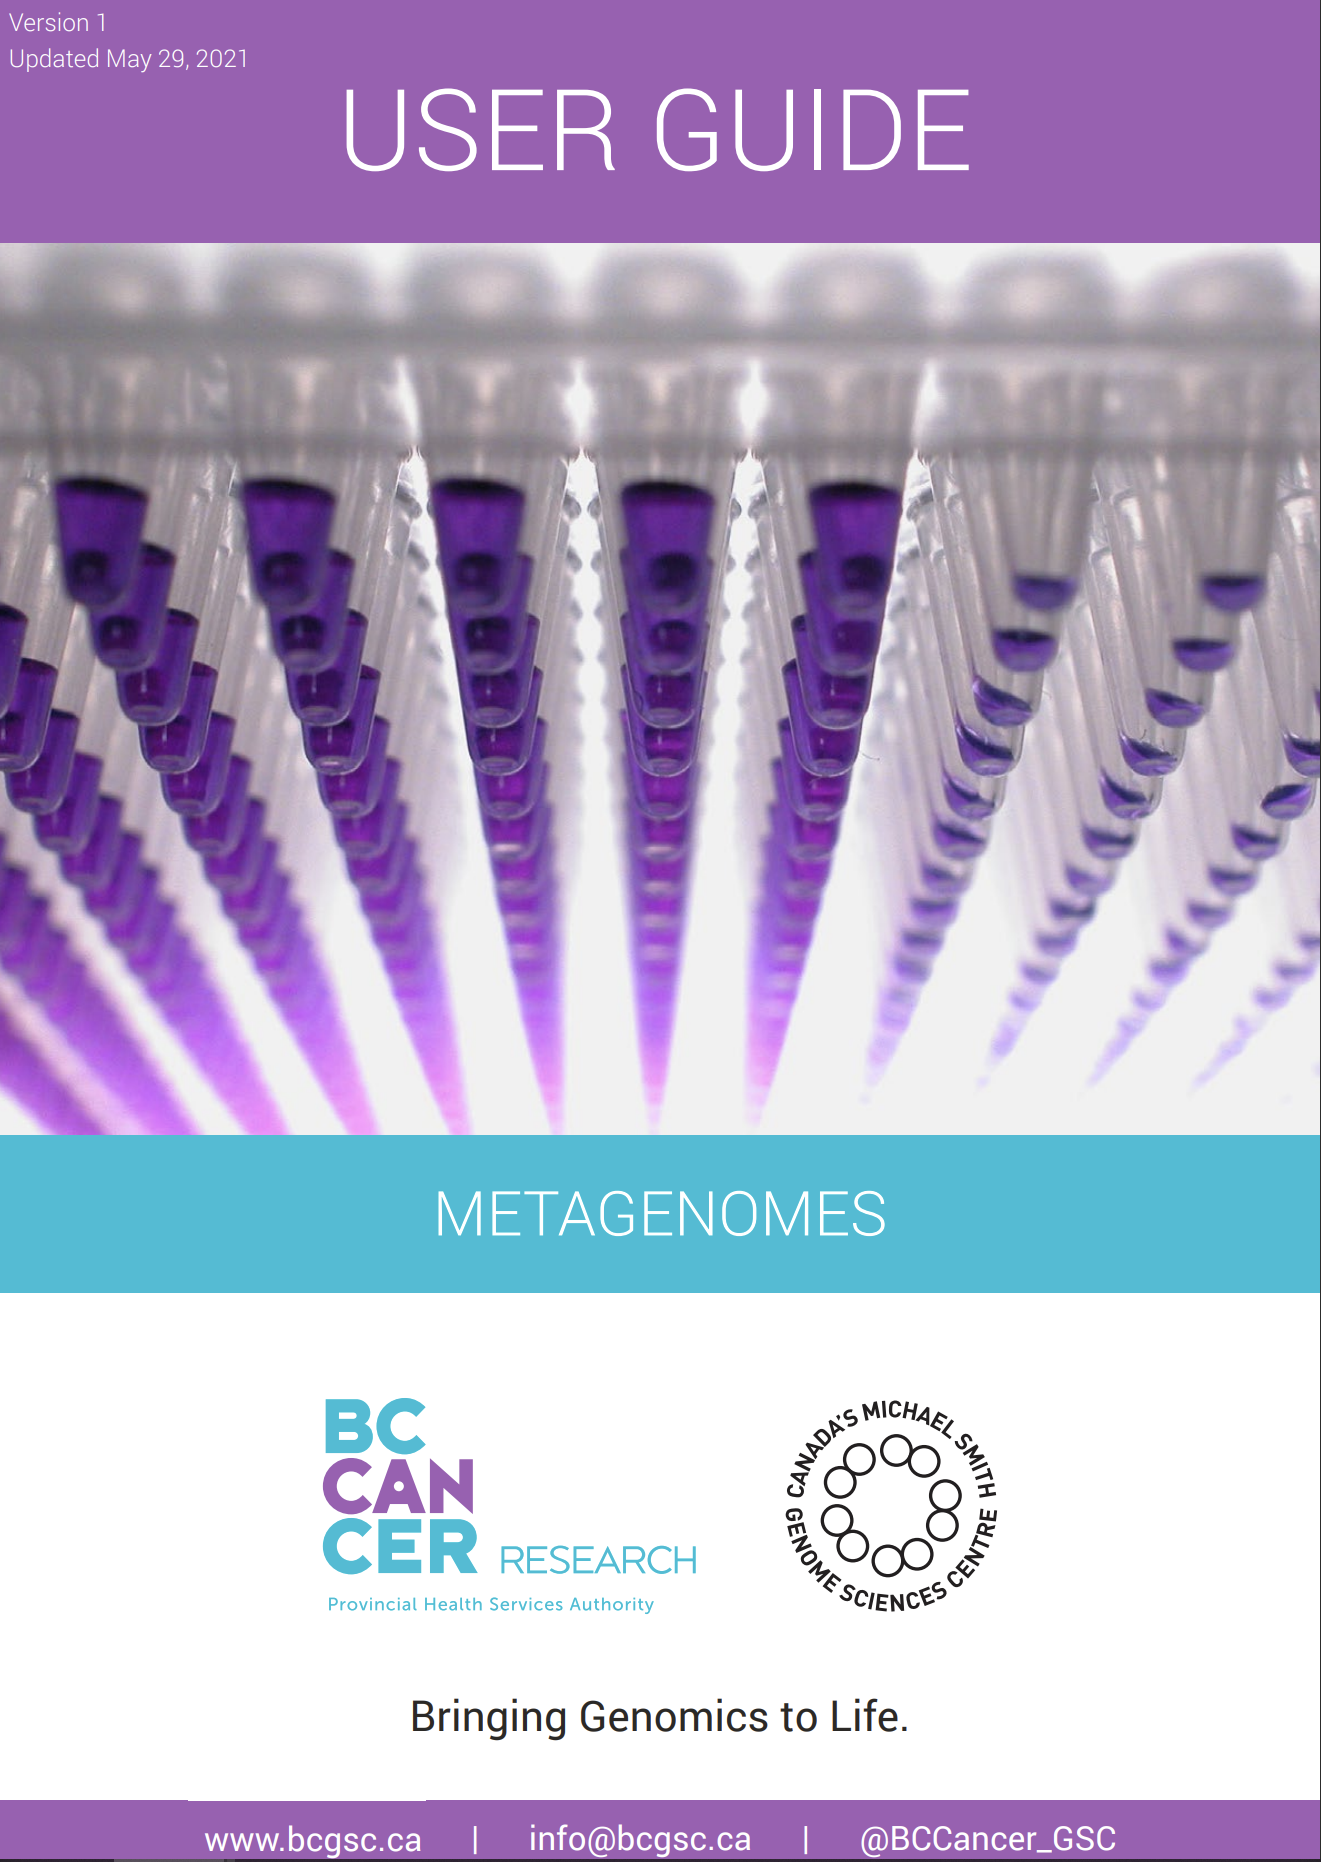 Metagenomes